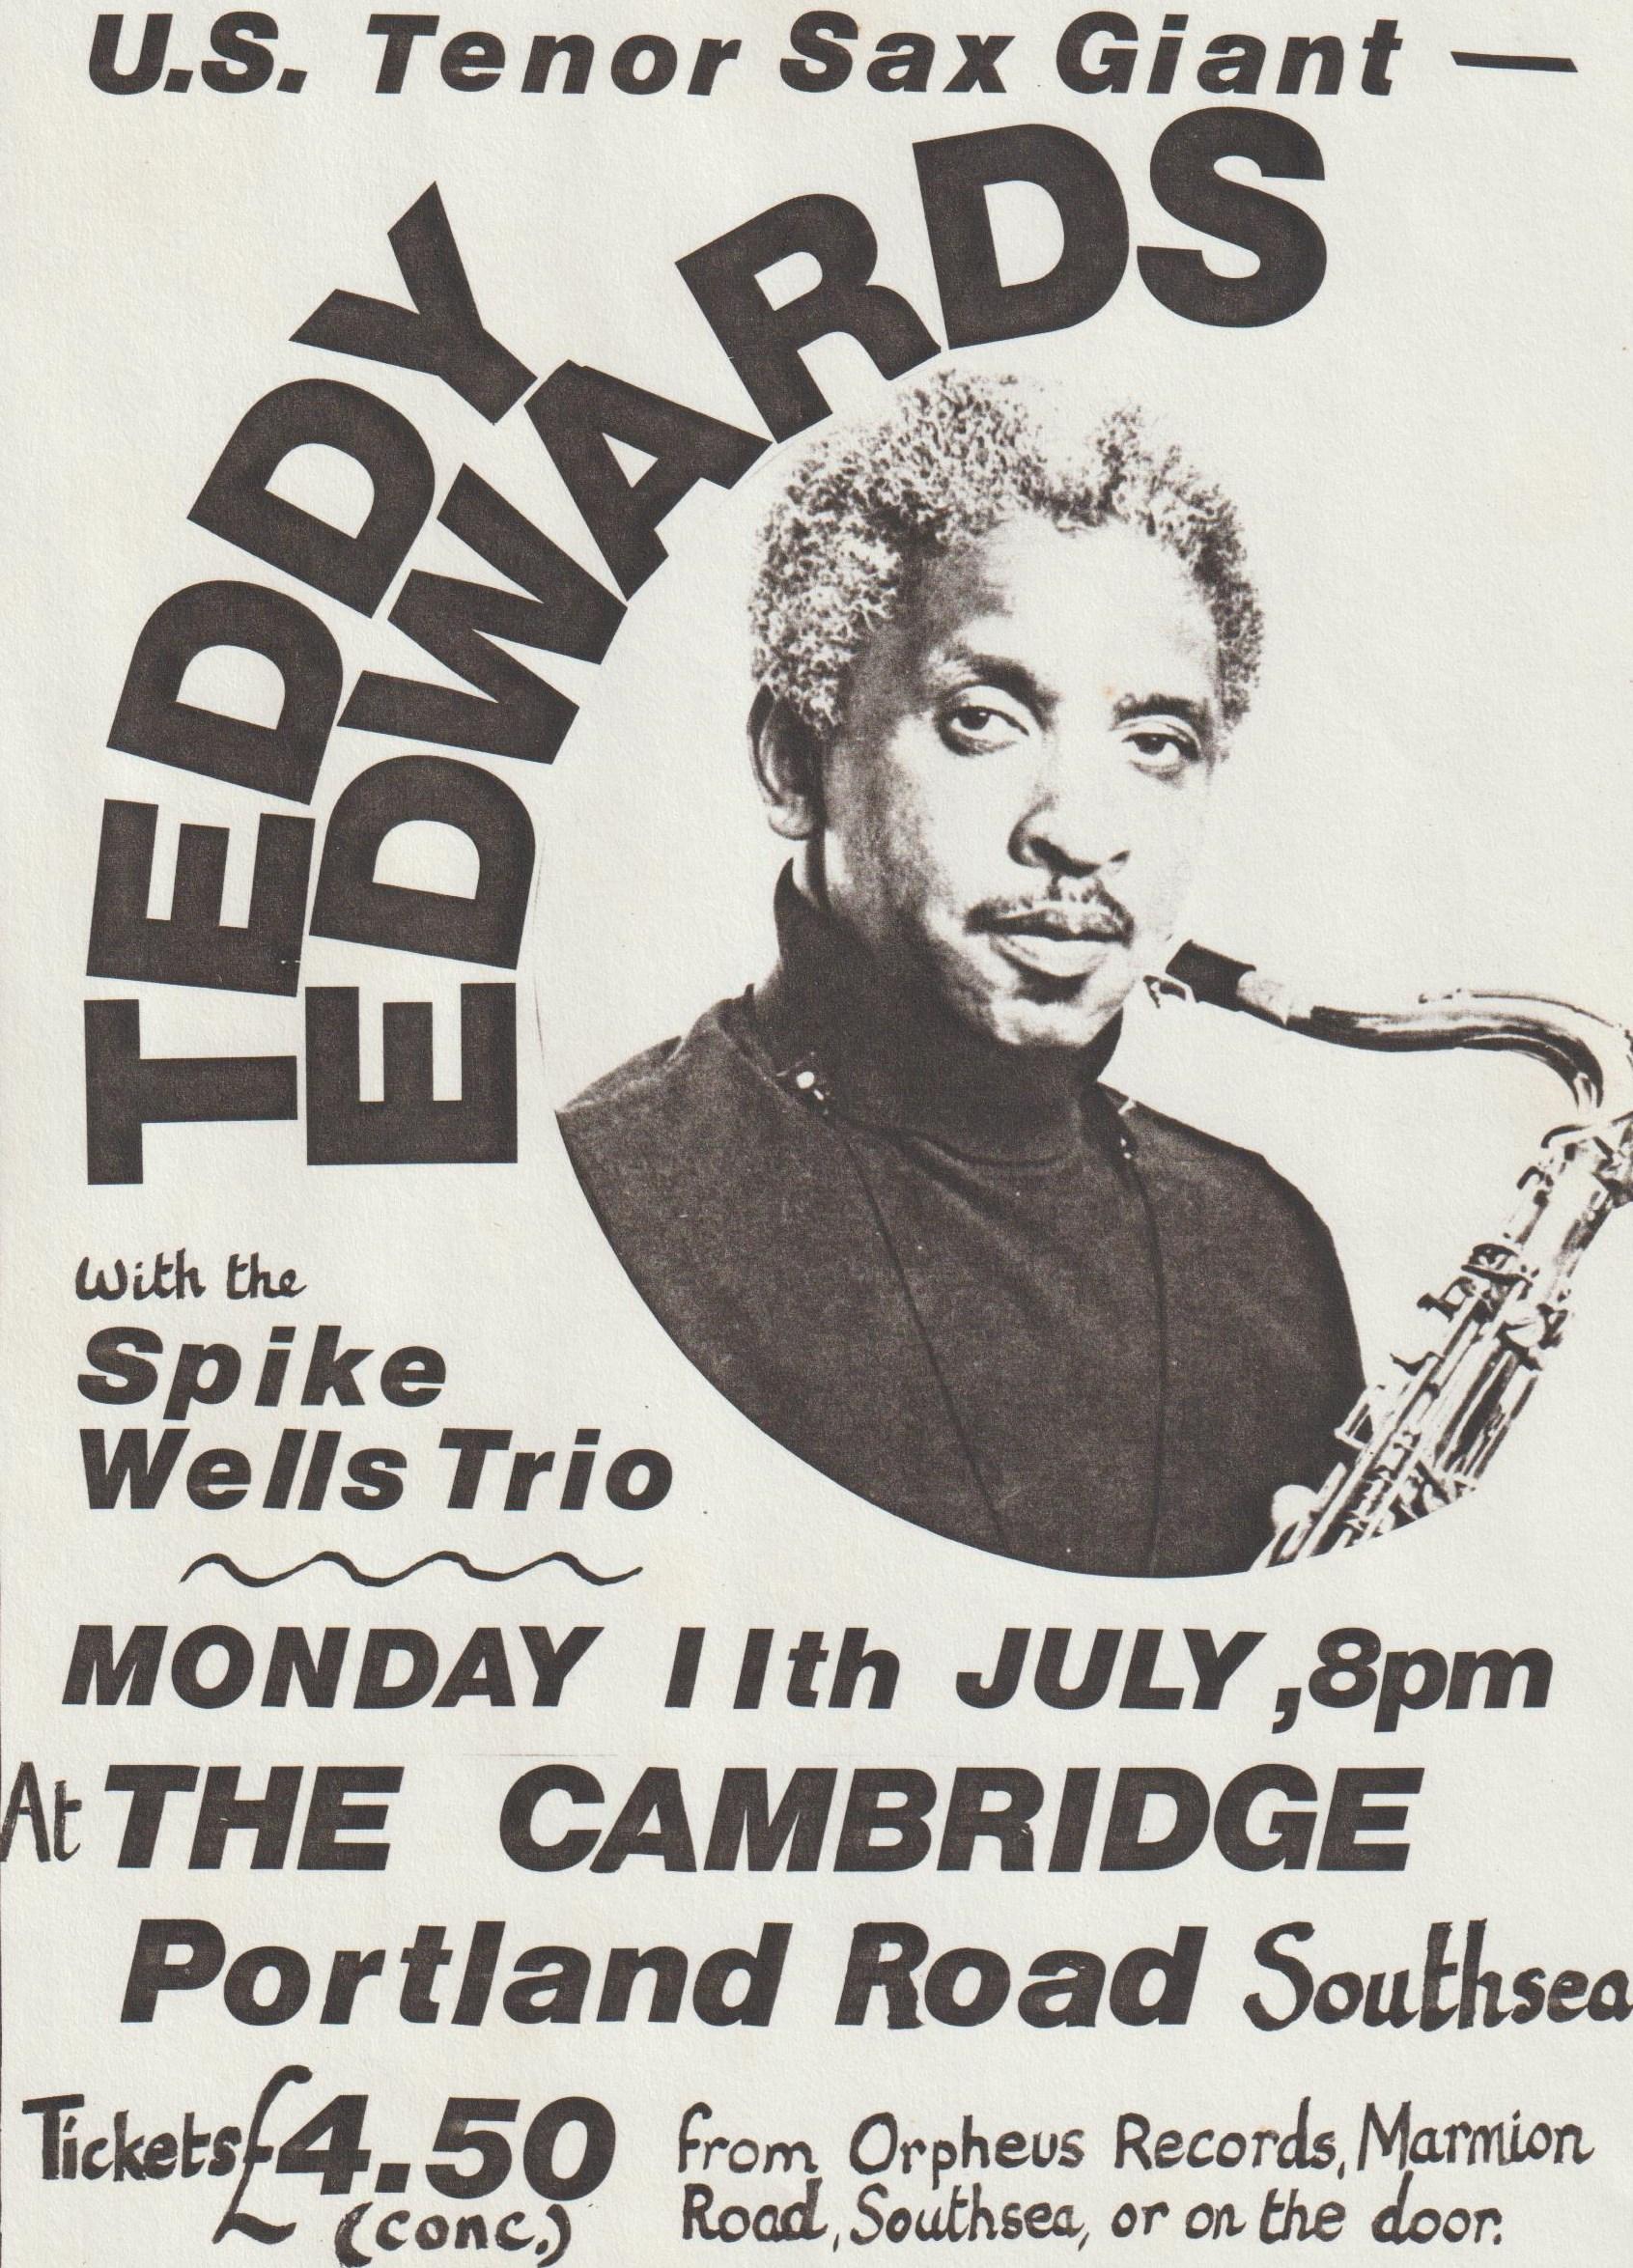 teddy edwards poster (2).jpg